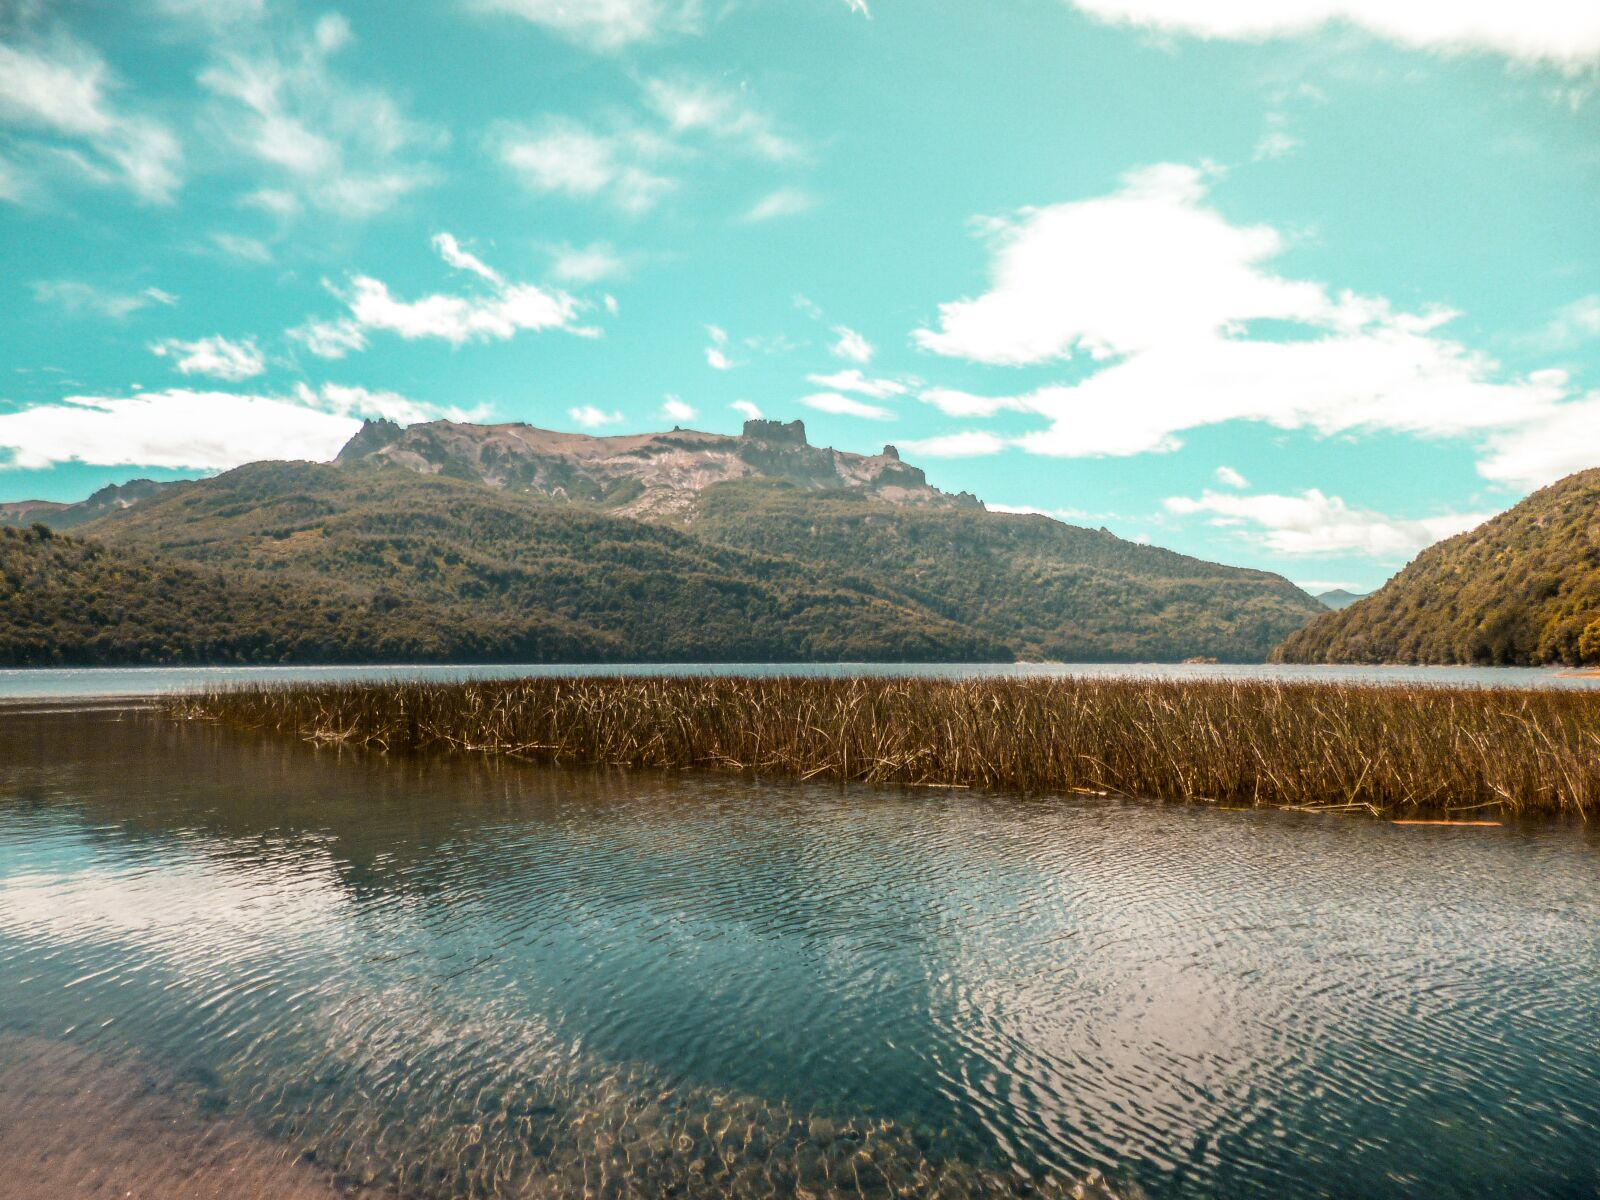 mountain, lake, nature